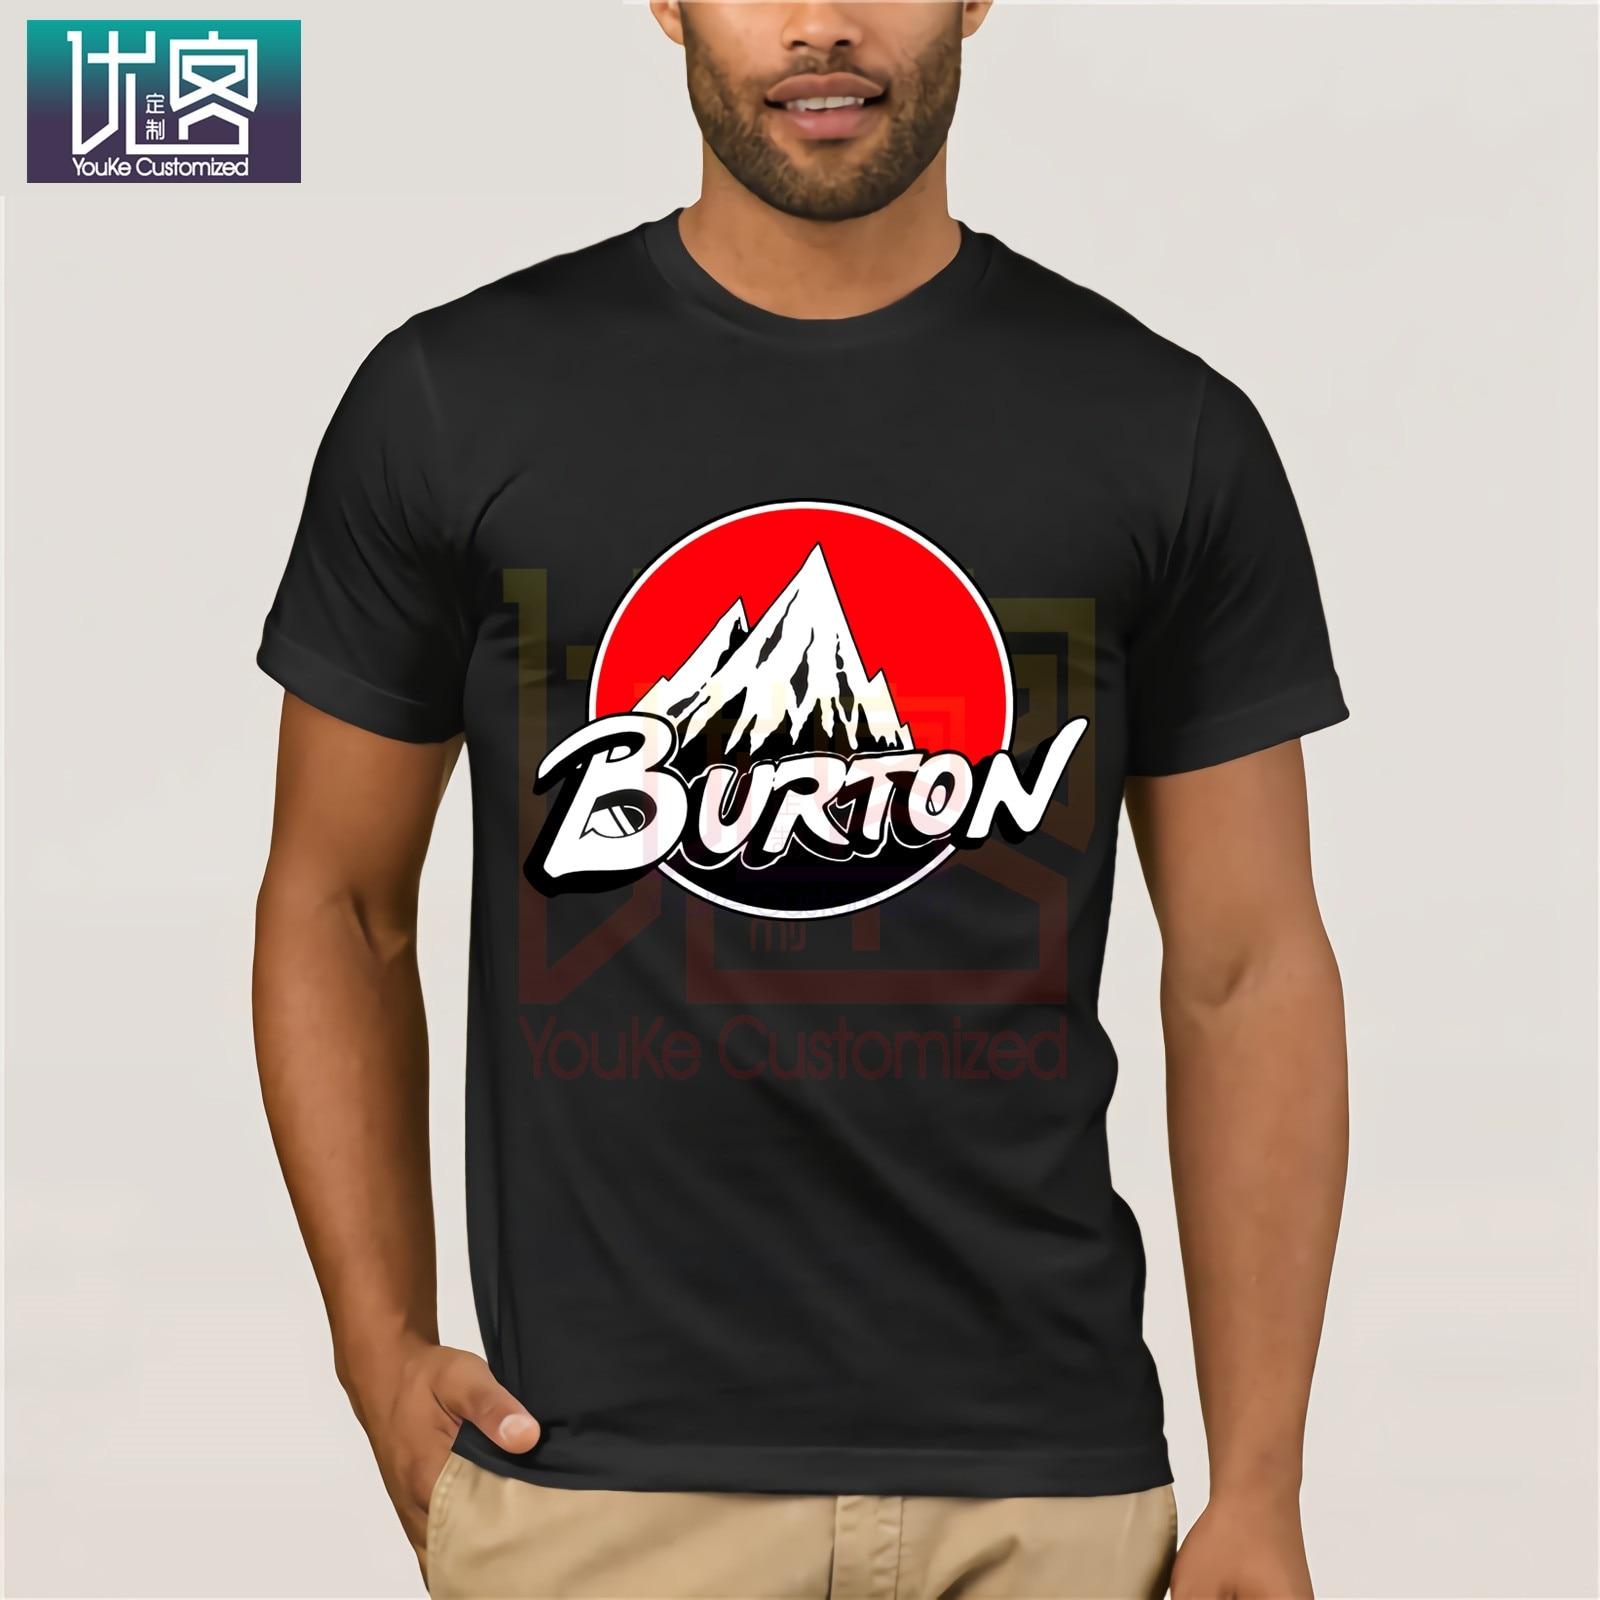 Red Burton Logo Arrow Snowboards T Shirt Cartoon Tee Shirt Homme Top Tees Men Cool 2019 Humor Tee Shirt 100% Cotton Tops Graphic